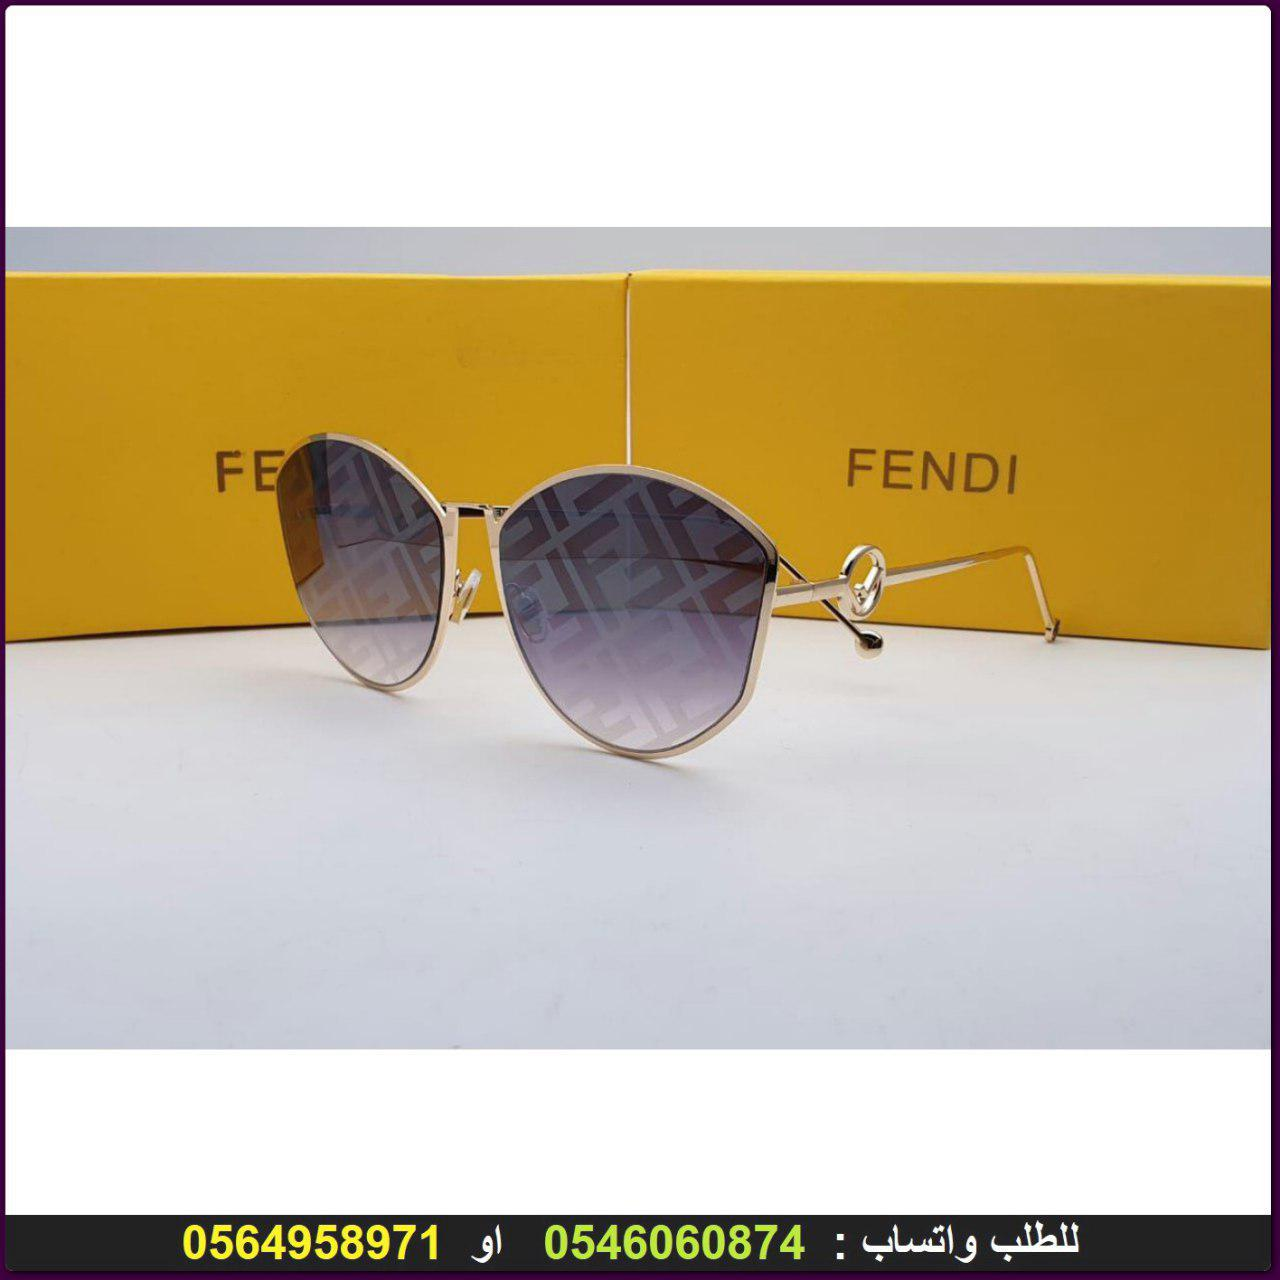 Pitanje Istaknut Skupstina نظارات فندي Herbandedi Org